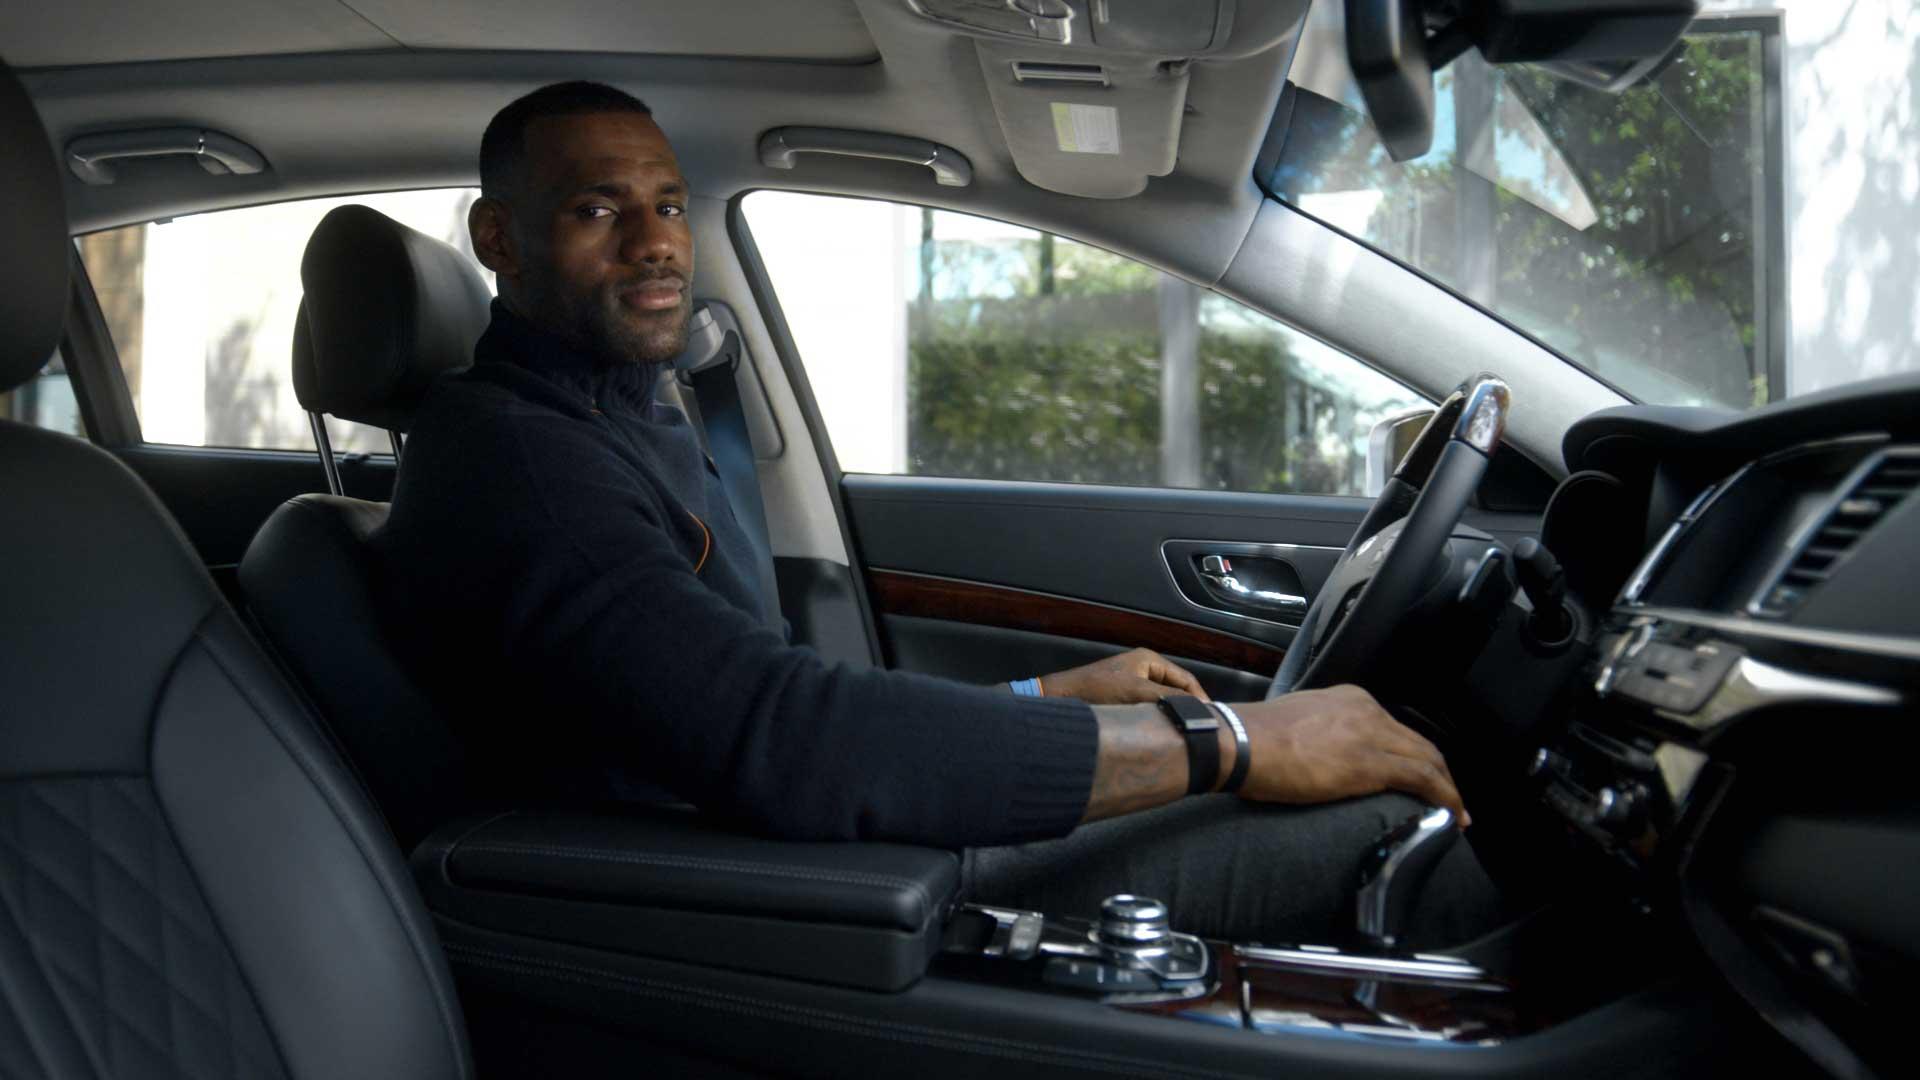 Kia luxury ambassador lebron james stars in a new ad campaign that debuts tonight